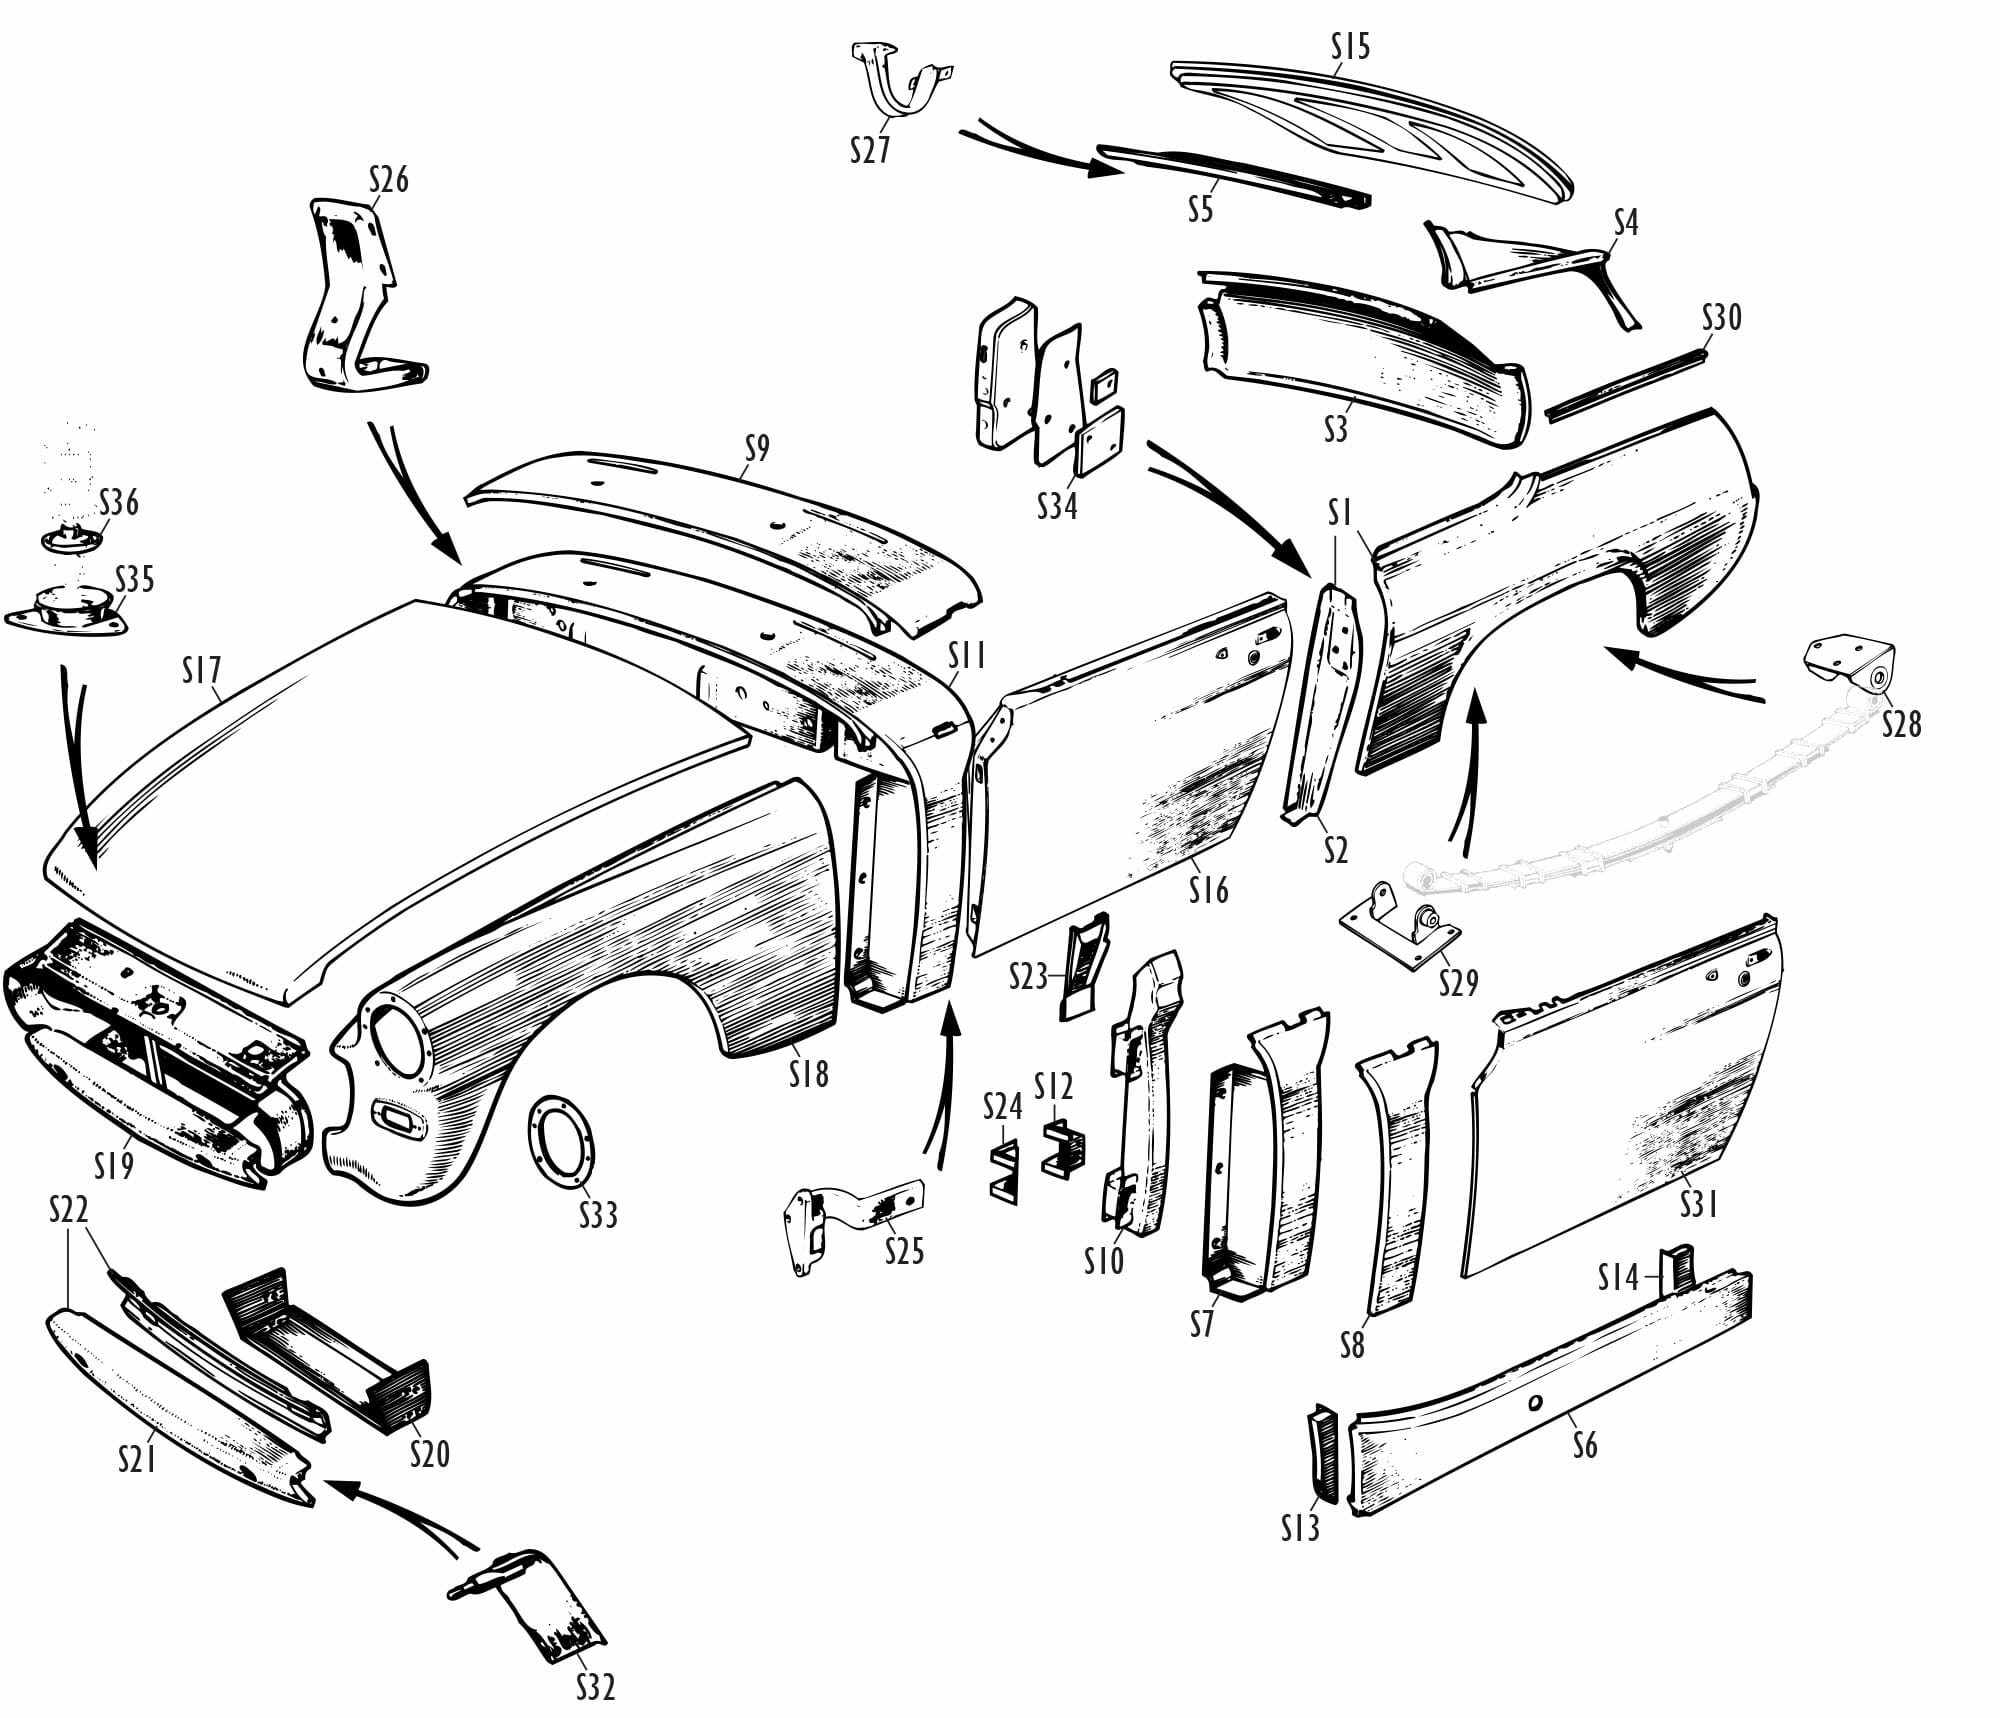 MG Midget Parts - MG Midget Skin Panels